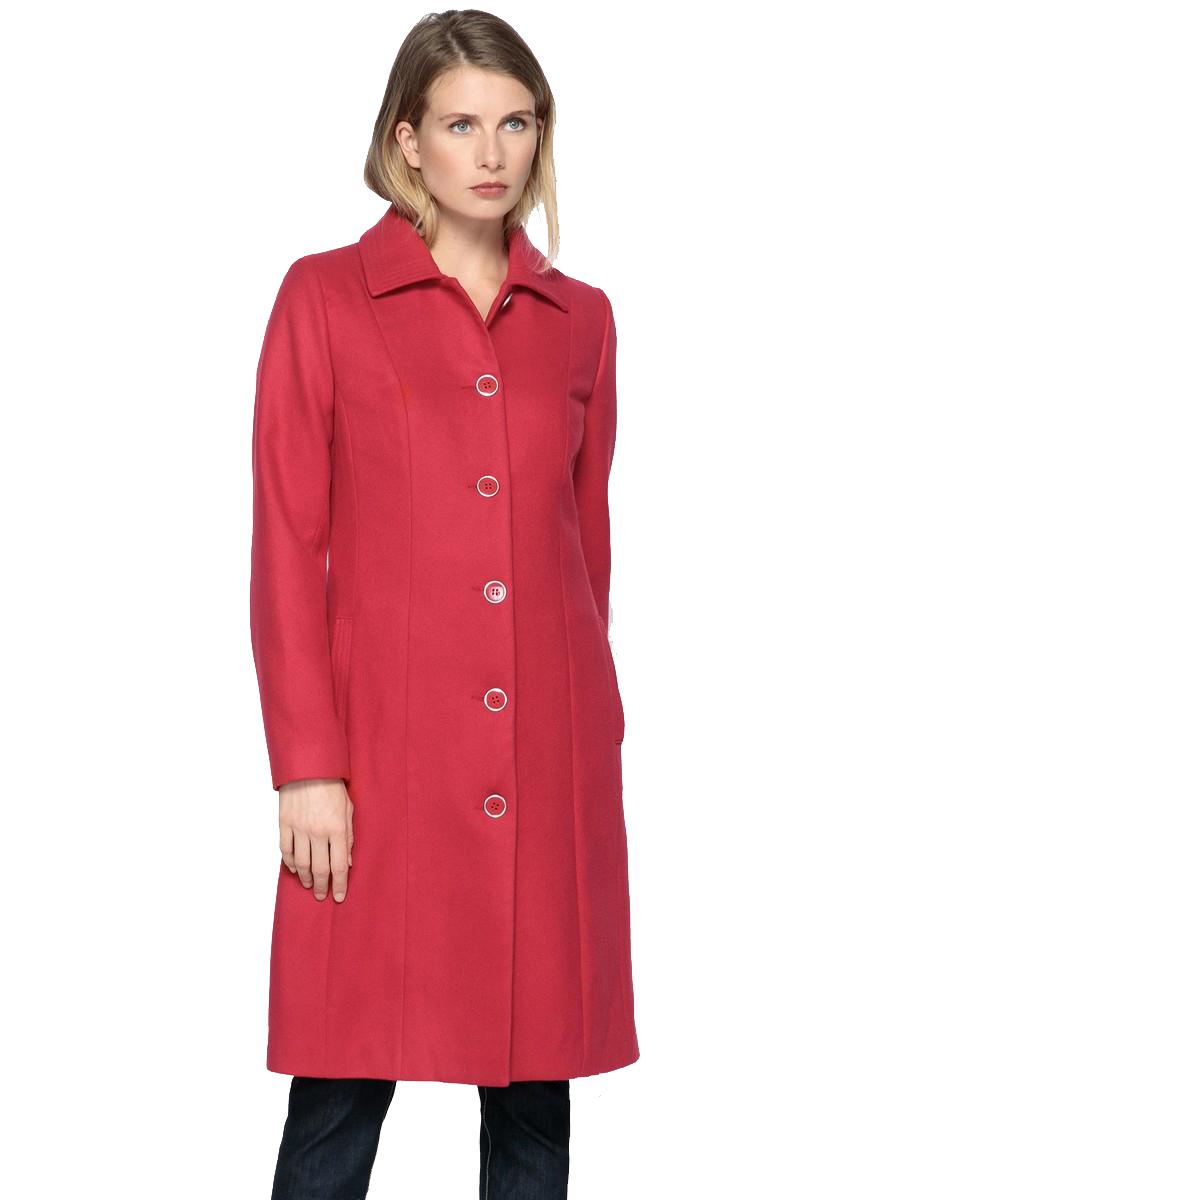 La rödoute kvinnor Classic Wool Coat 35000382